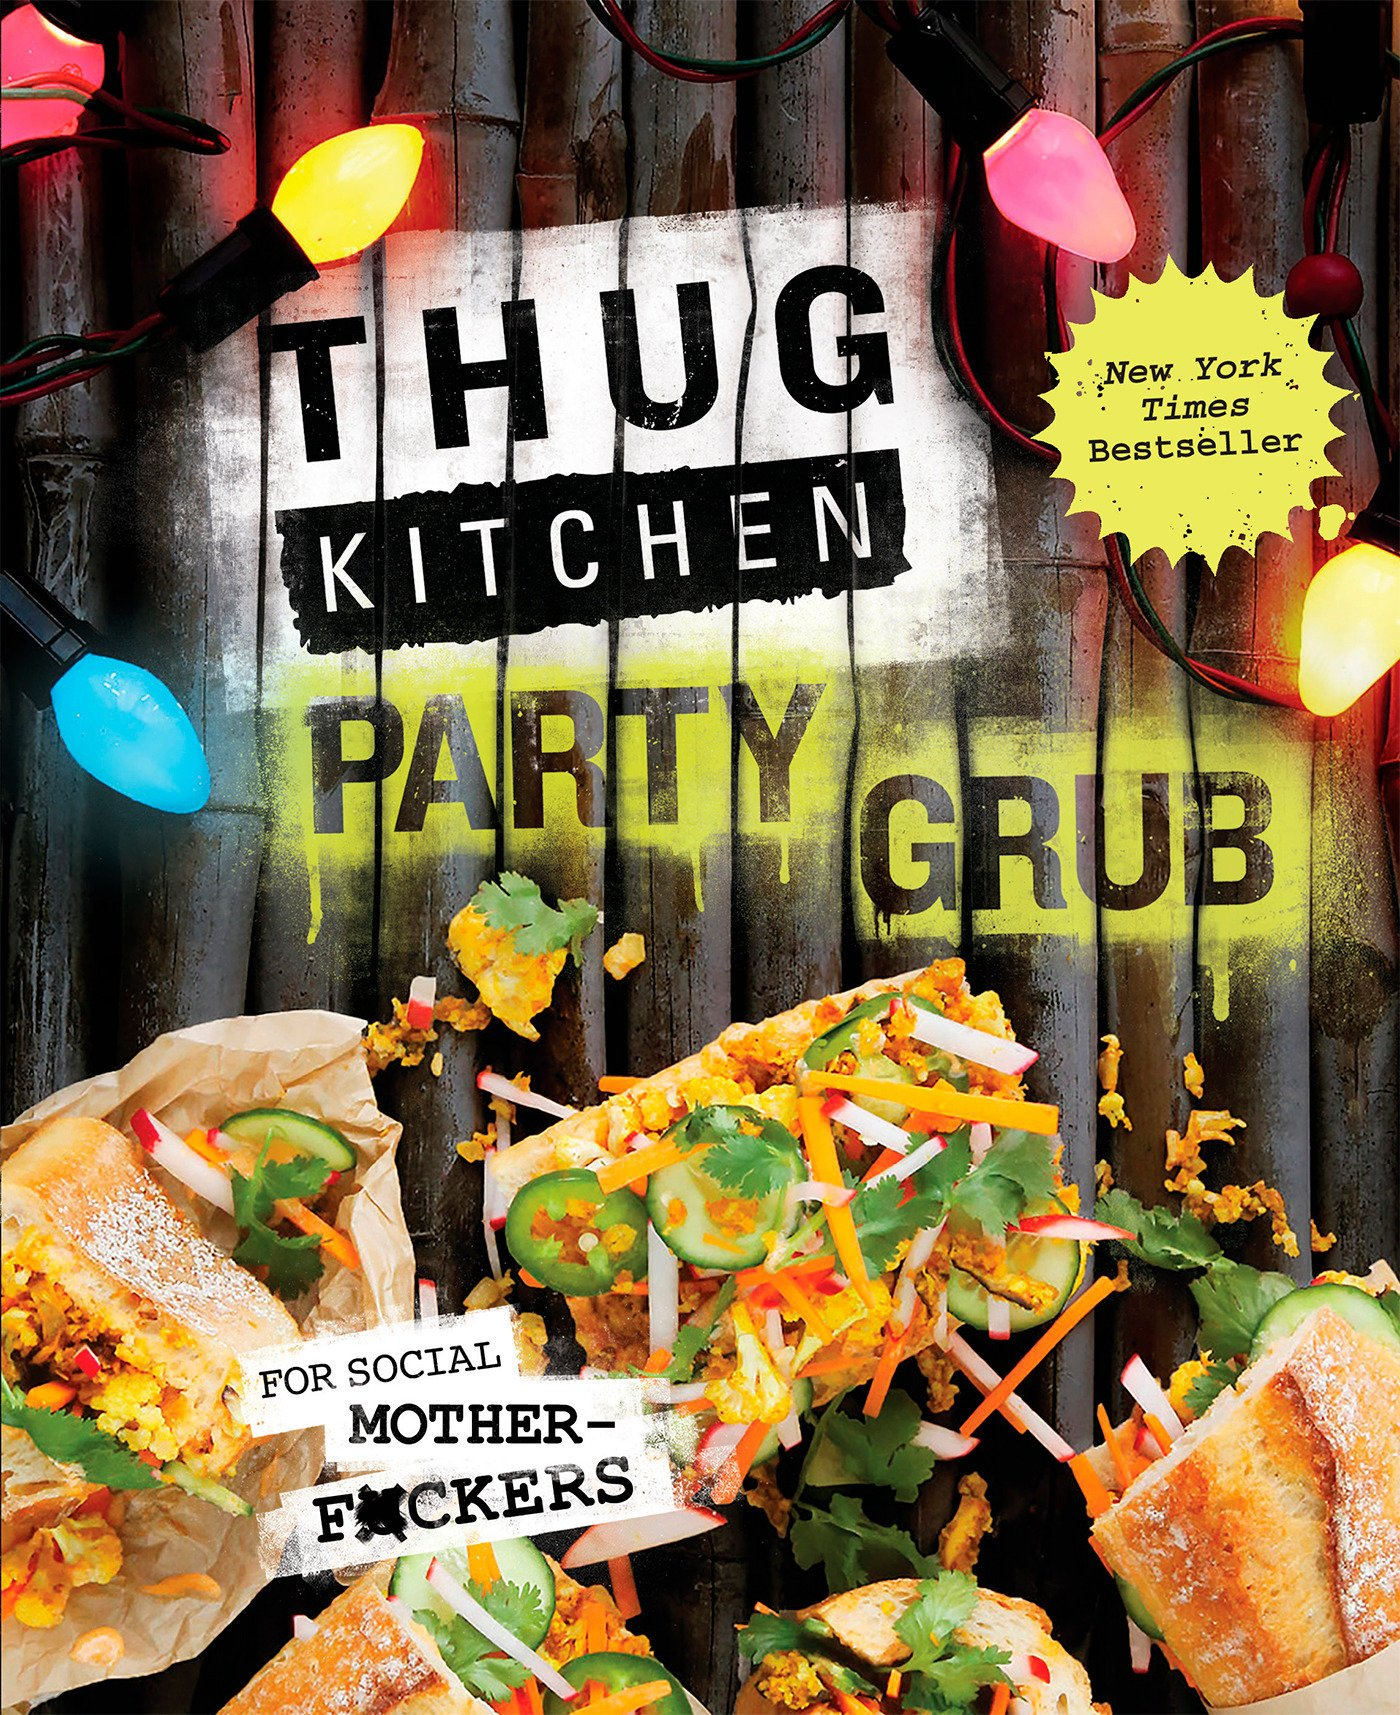 Thug Kitchen Party Grub Cookbooks product image